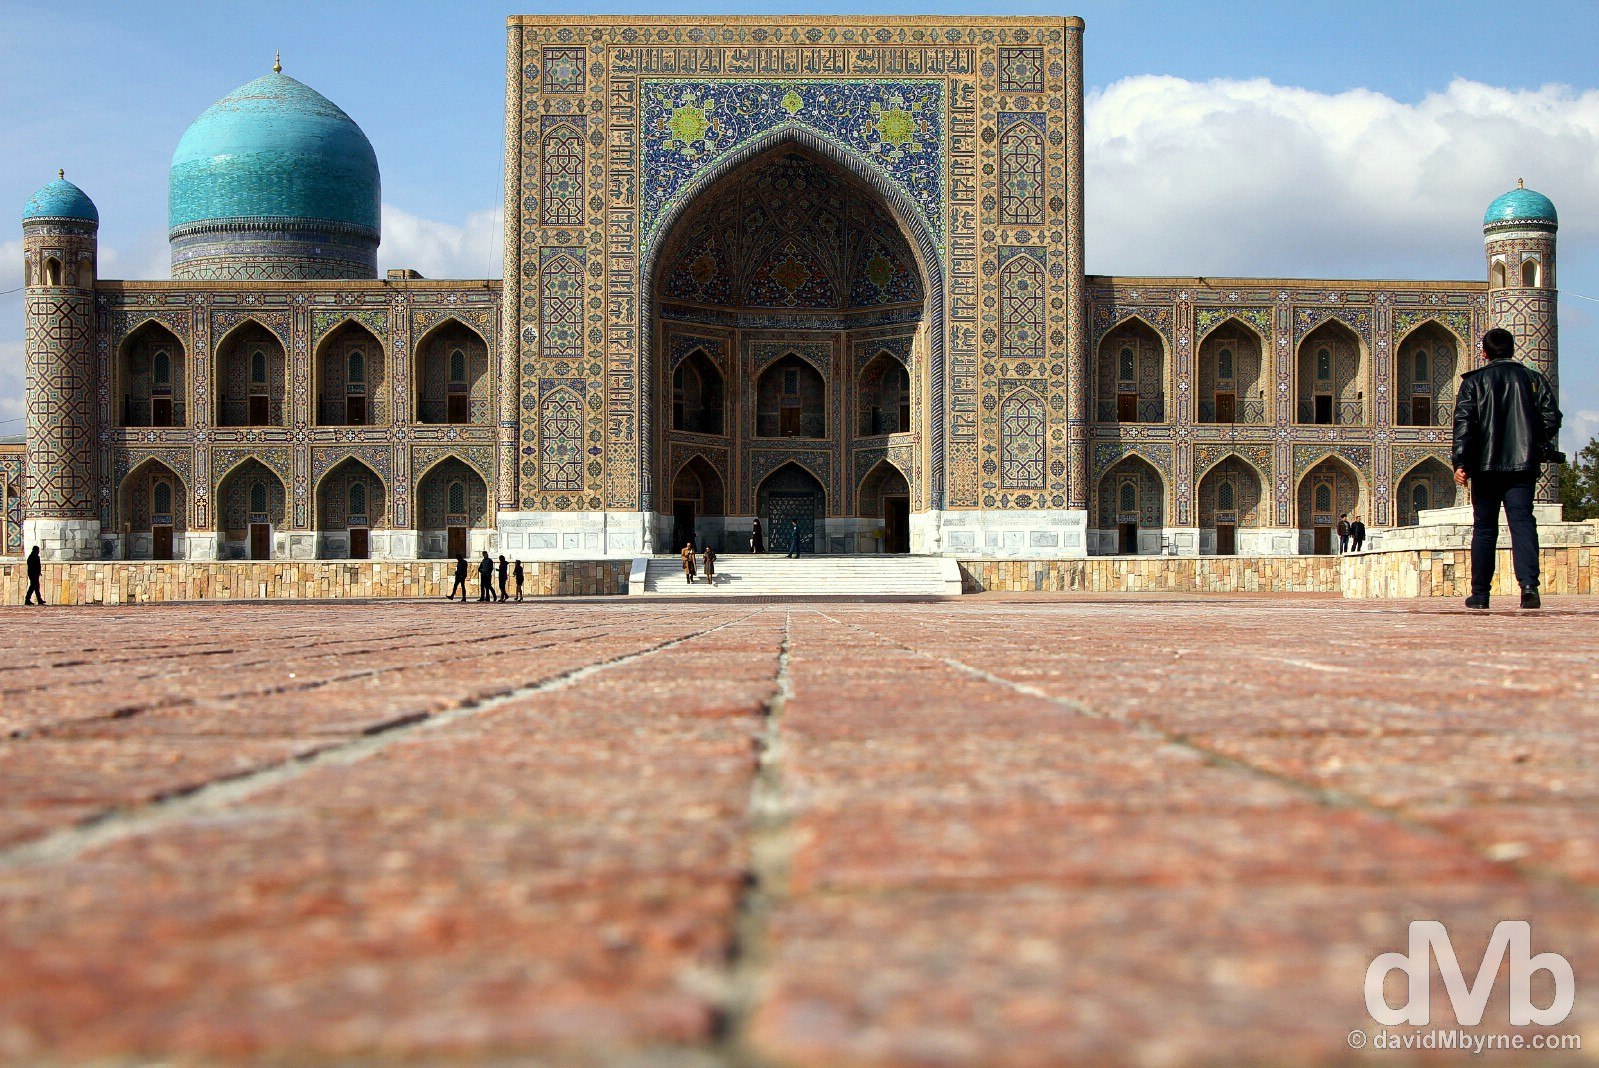 The Tilla-Kari Medressa of the Registan in Samarkand, Uzbekistan. March 8, 2015.